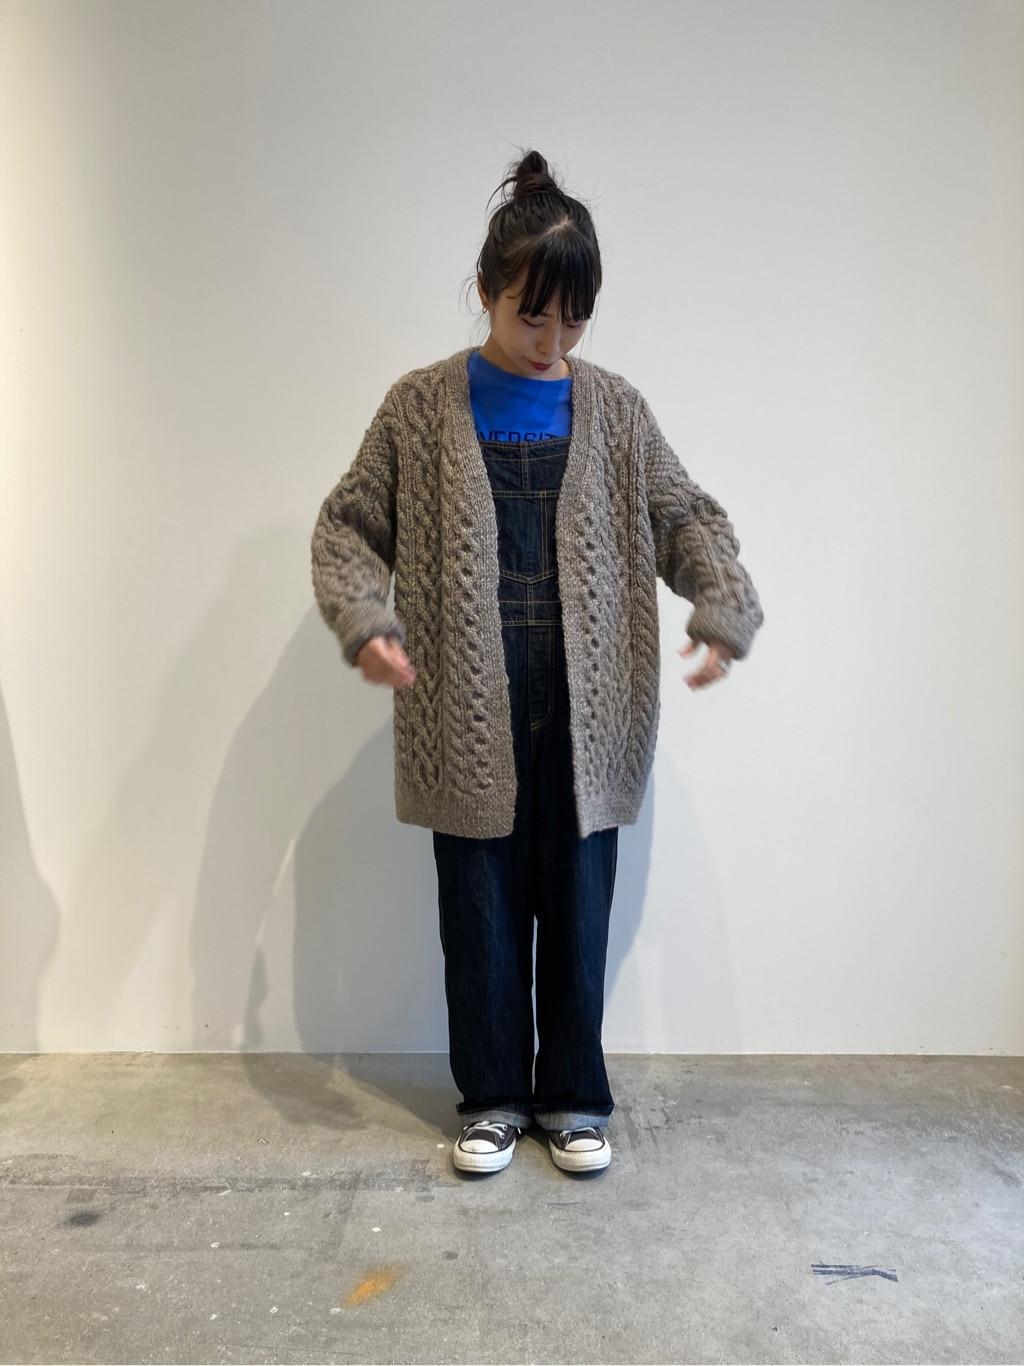 FLAT AMB 名古屋栄路面 2020.09.28